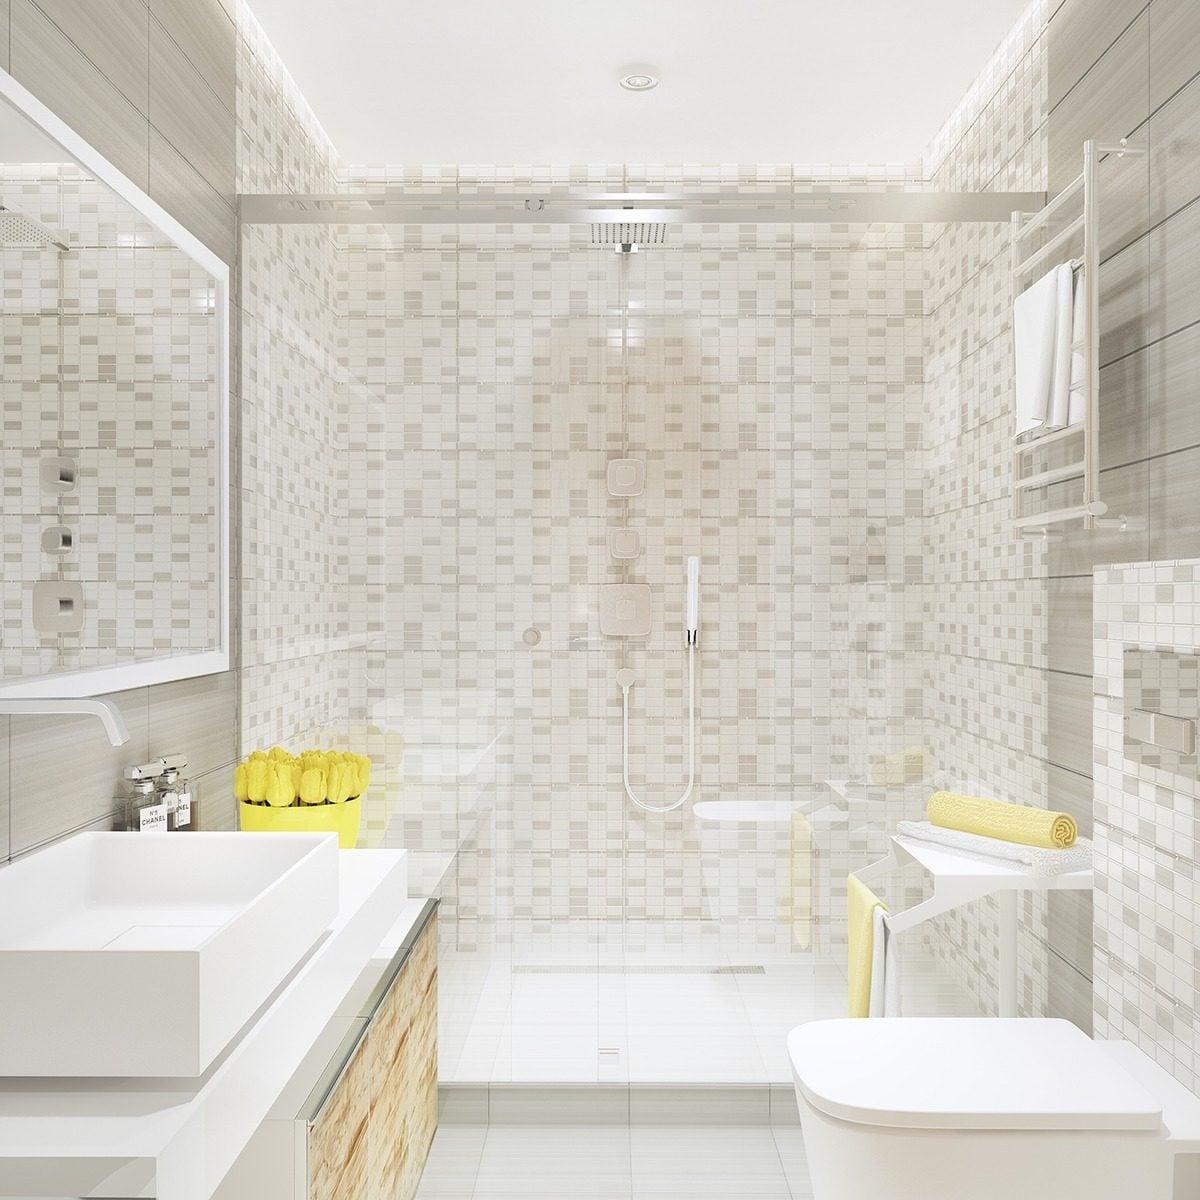 29gray-tile-bathroom